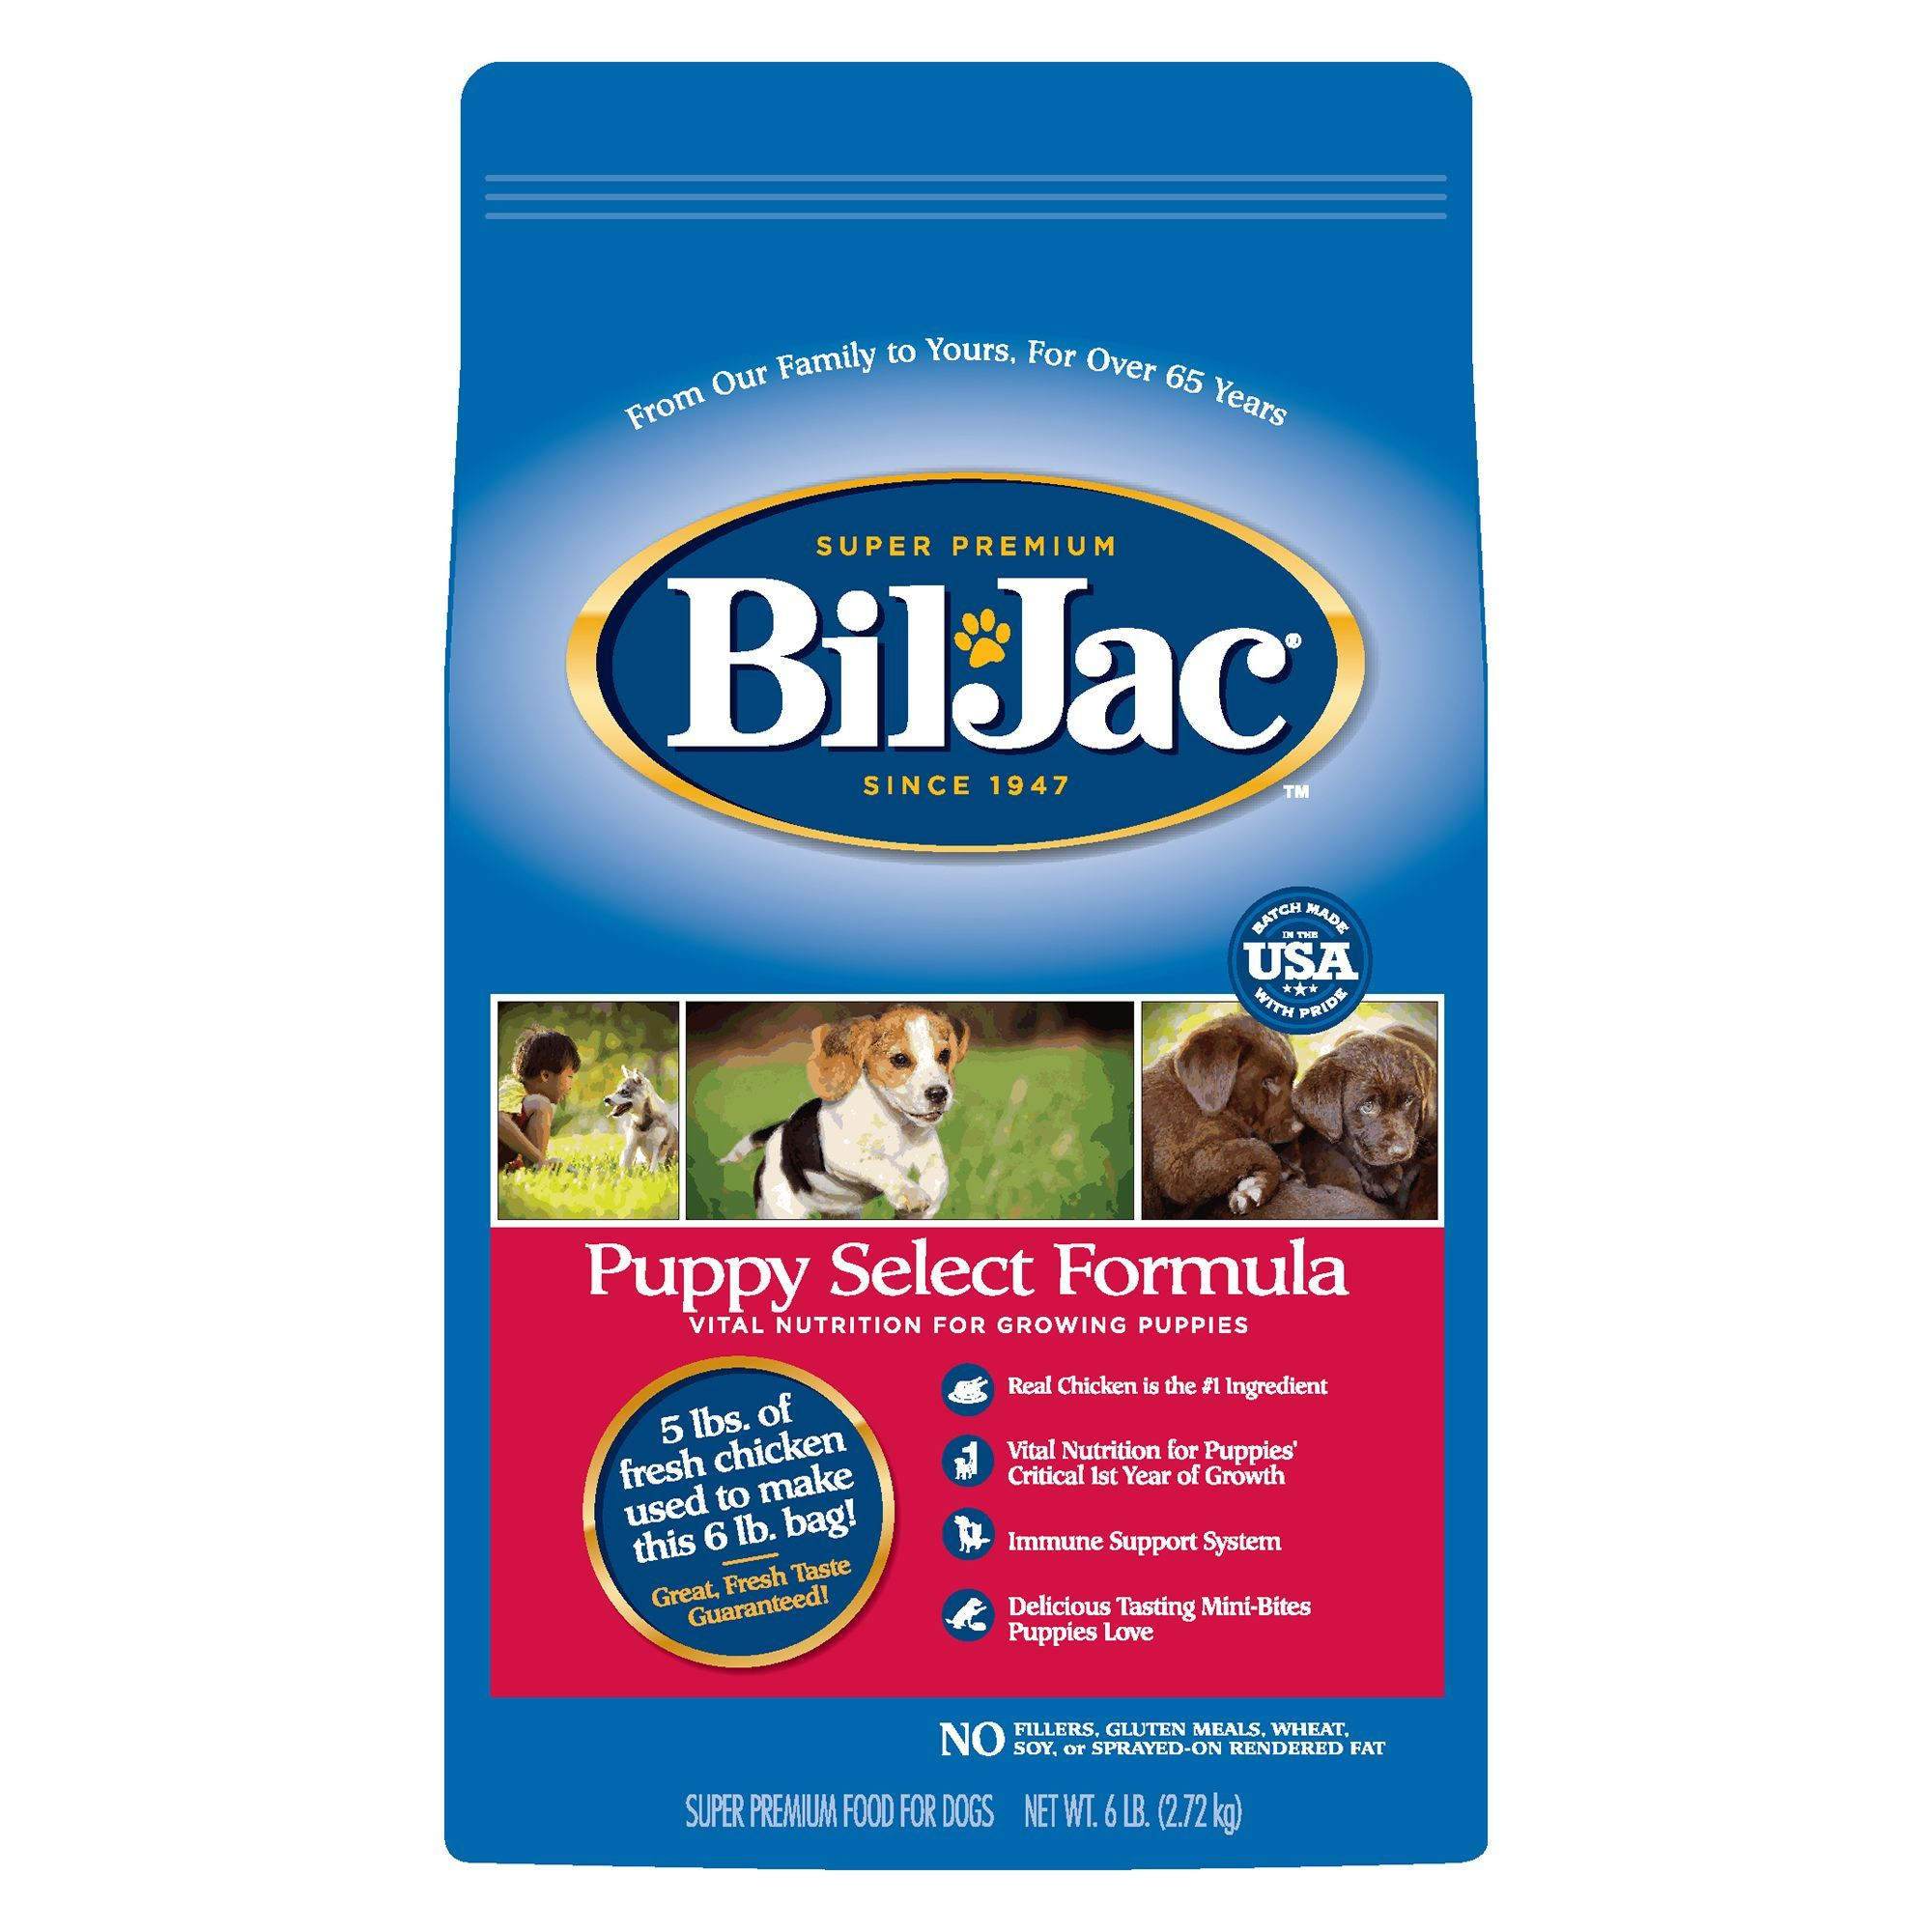 Biljac puppy select formula puppy food puppy food dry